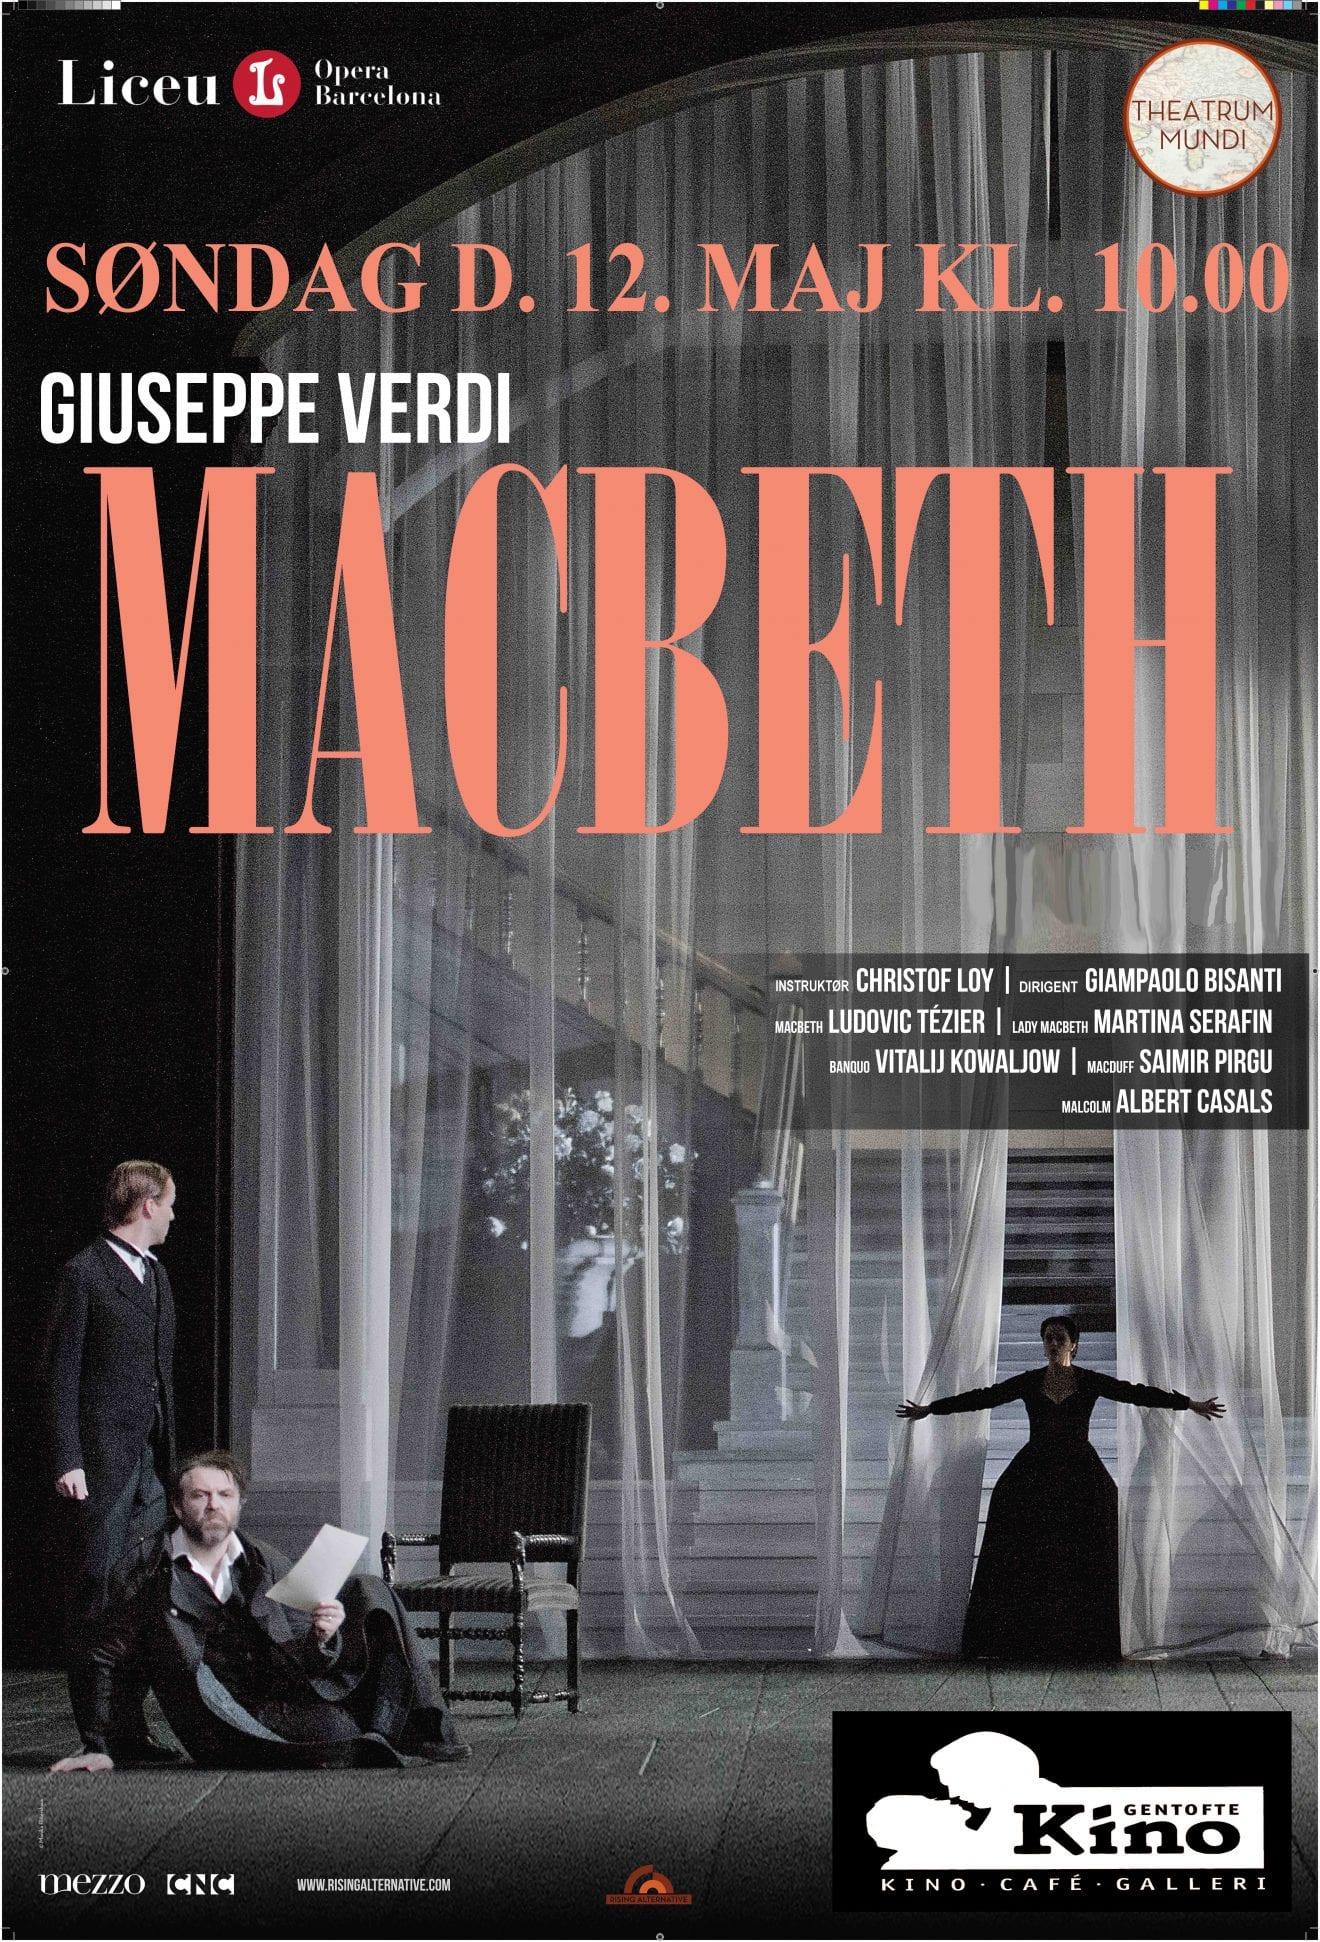 Operabio - Macbeth